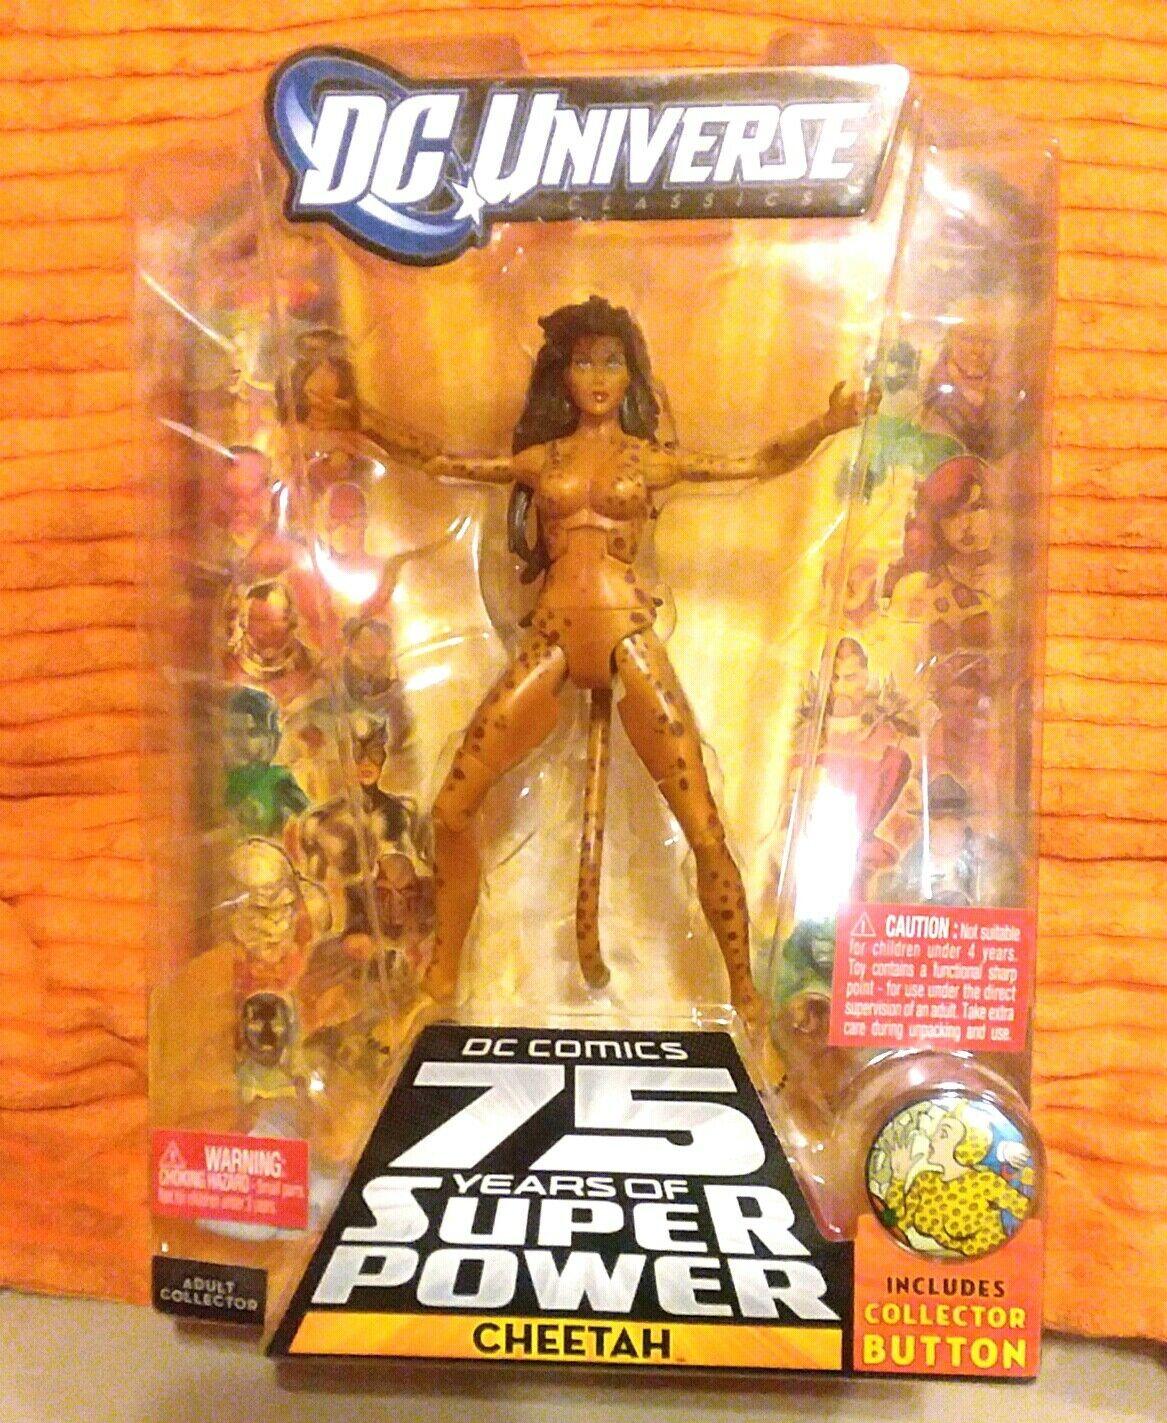 Cheetah NUDO ricordato Variante cifra DC Universe classeics WAVE 13 NUOVO inpackage